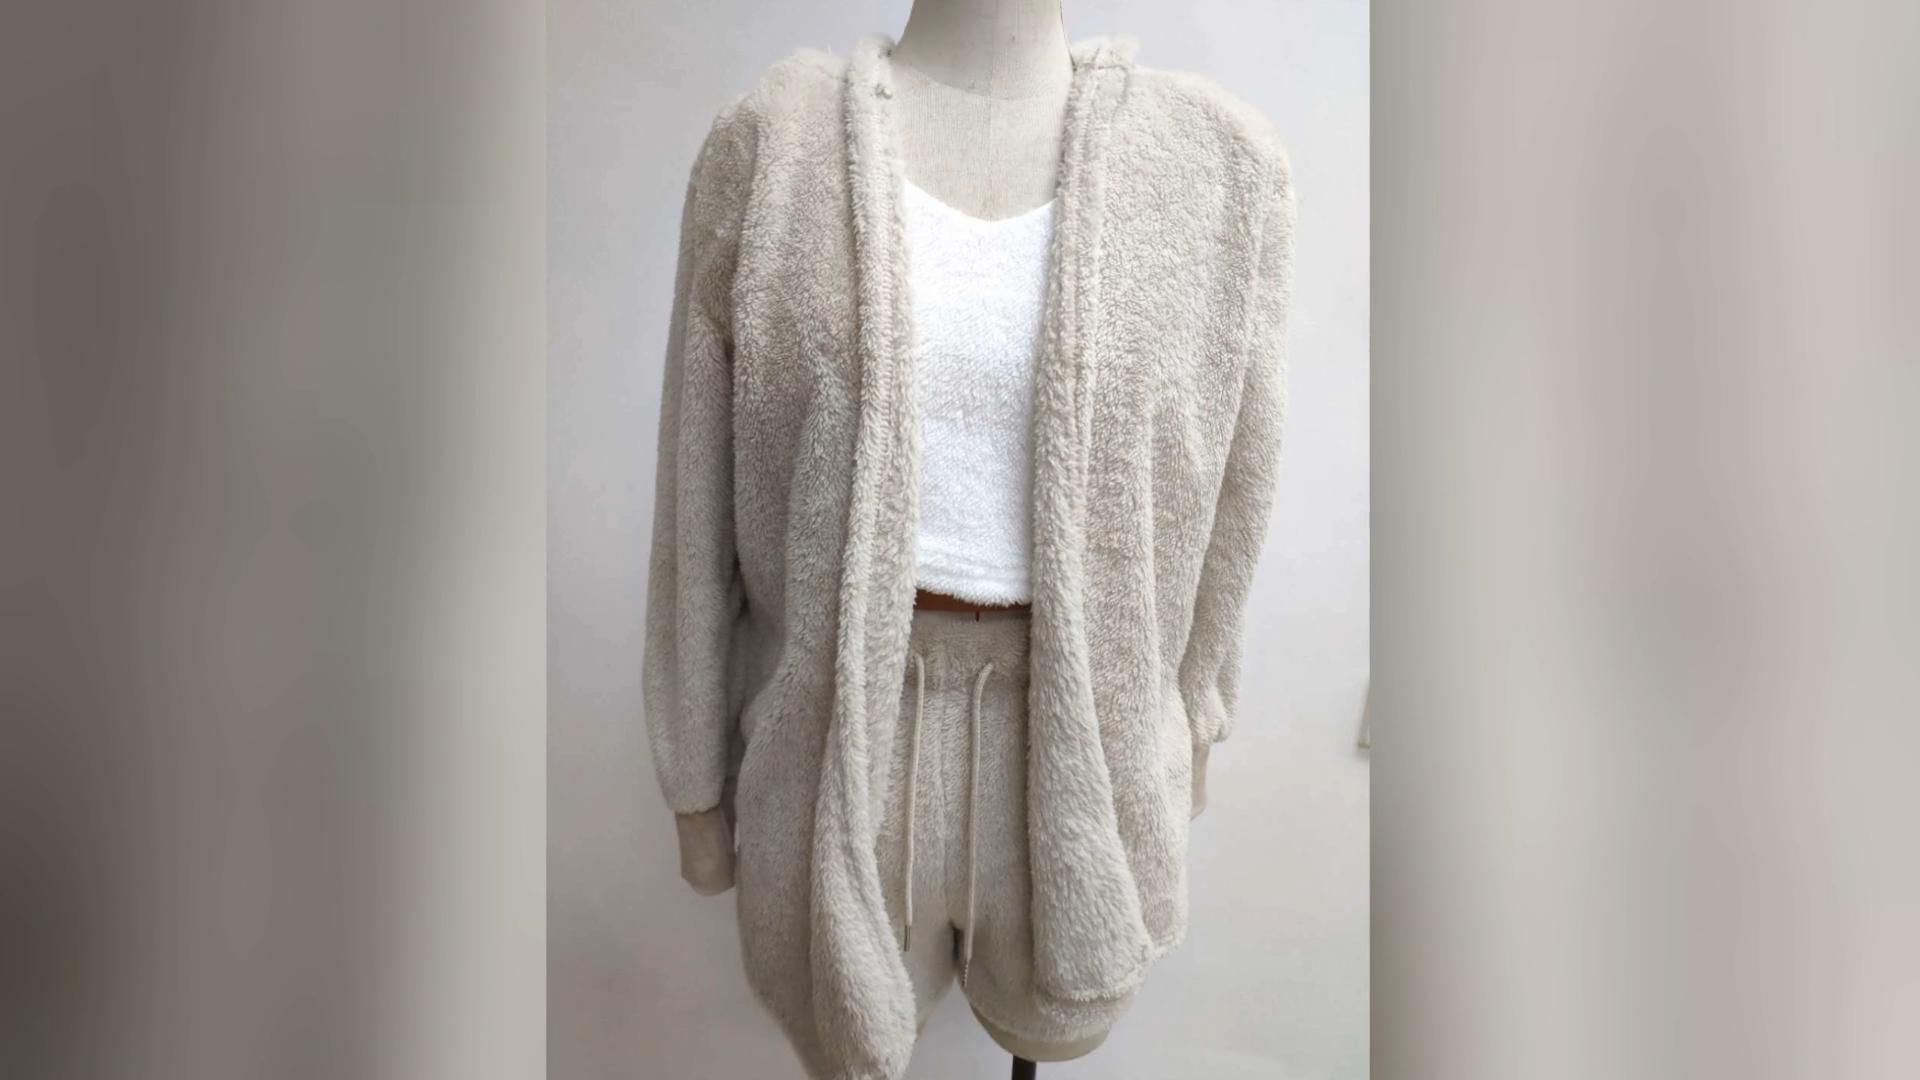 Winter Warm Vrouwen Slapen Dames Pluche 3 Stuks Pyjama Set Plus Size Nachtkleding